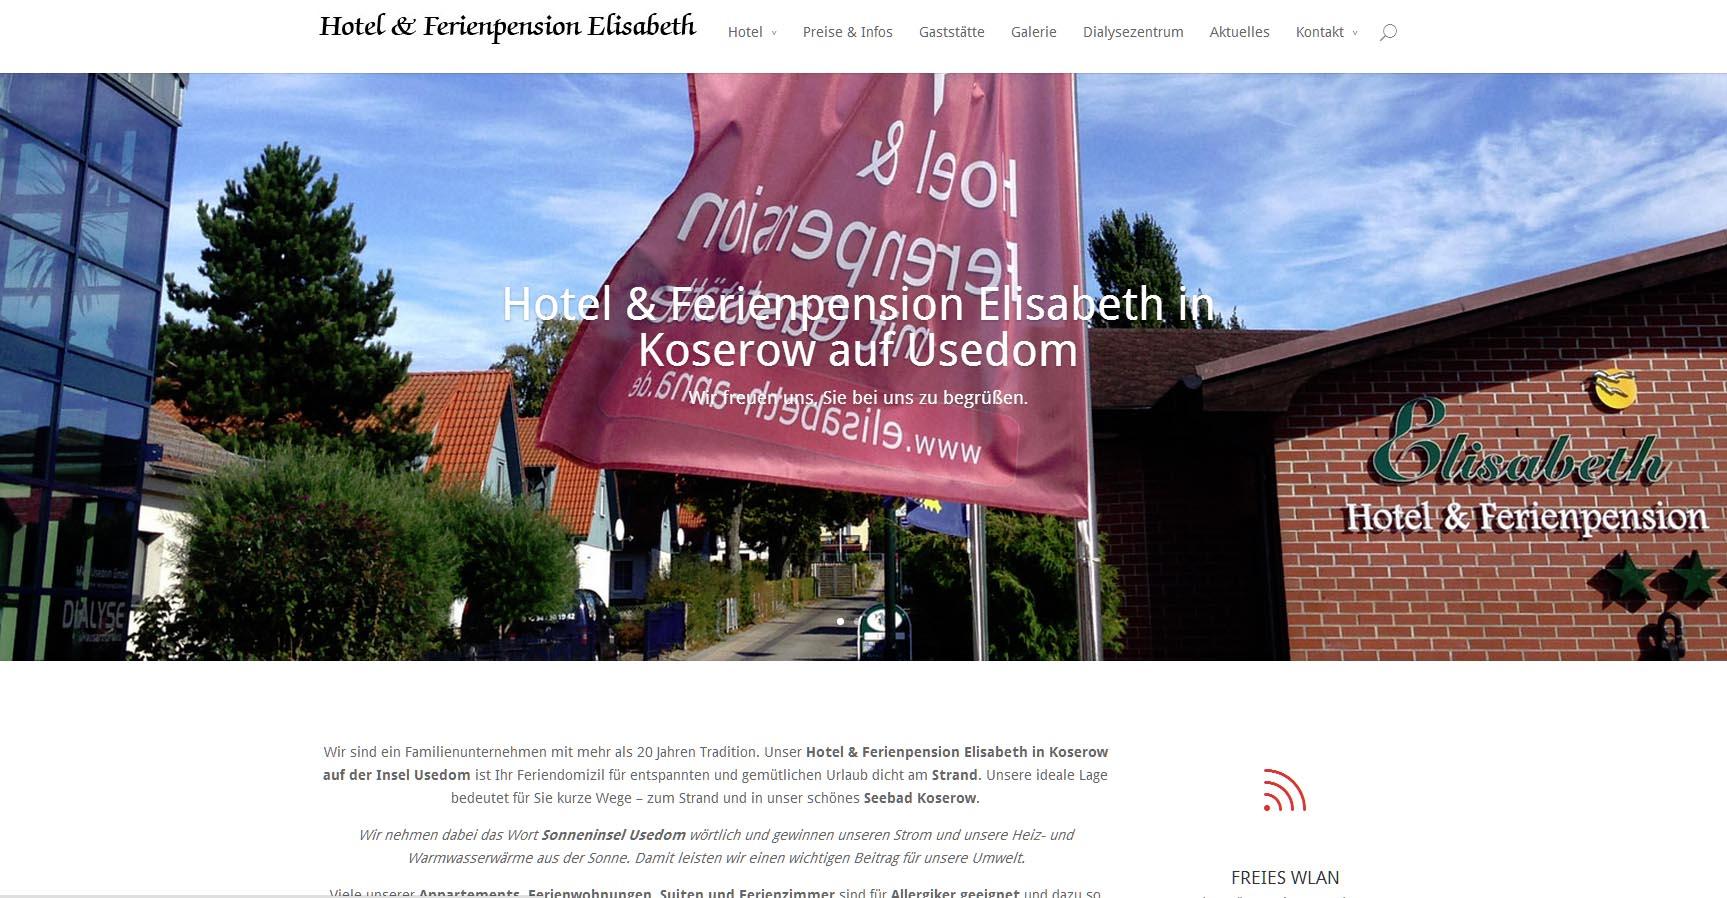 Hotel Ferienpension Elisabeth Koserow Usedom